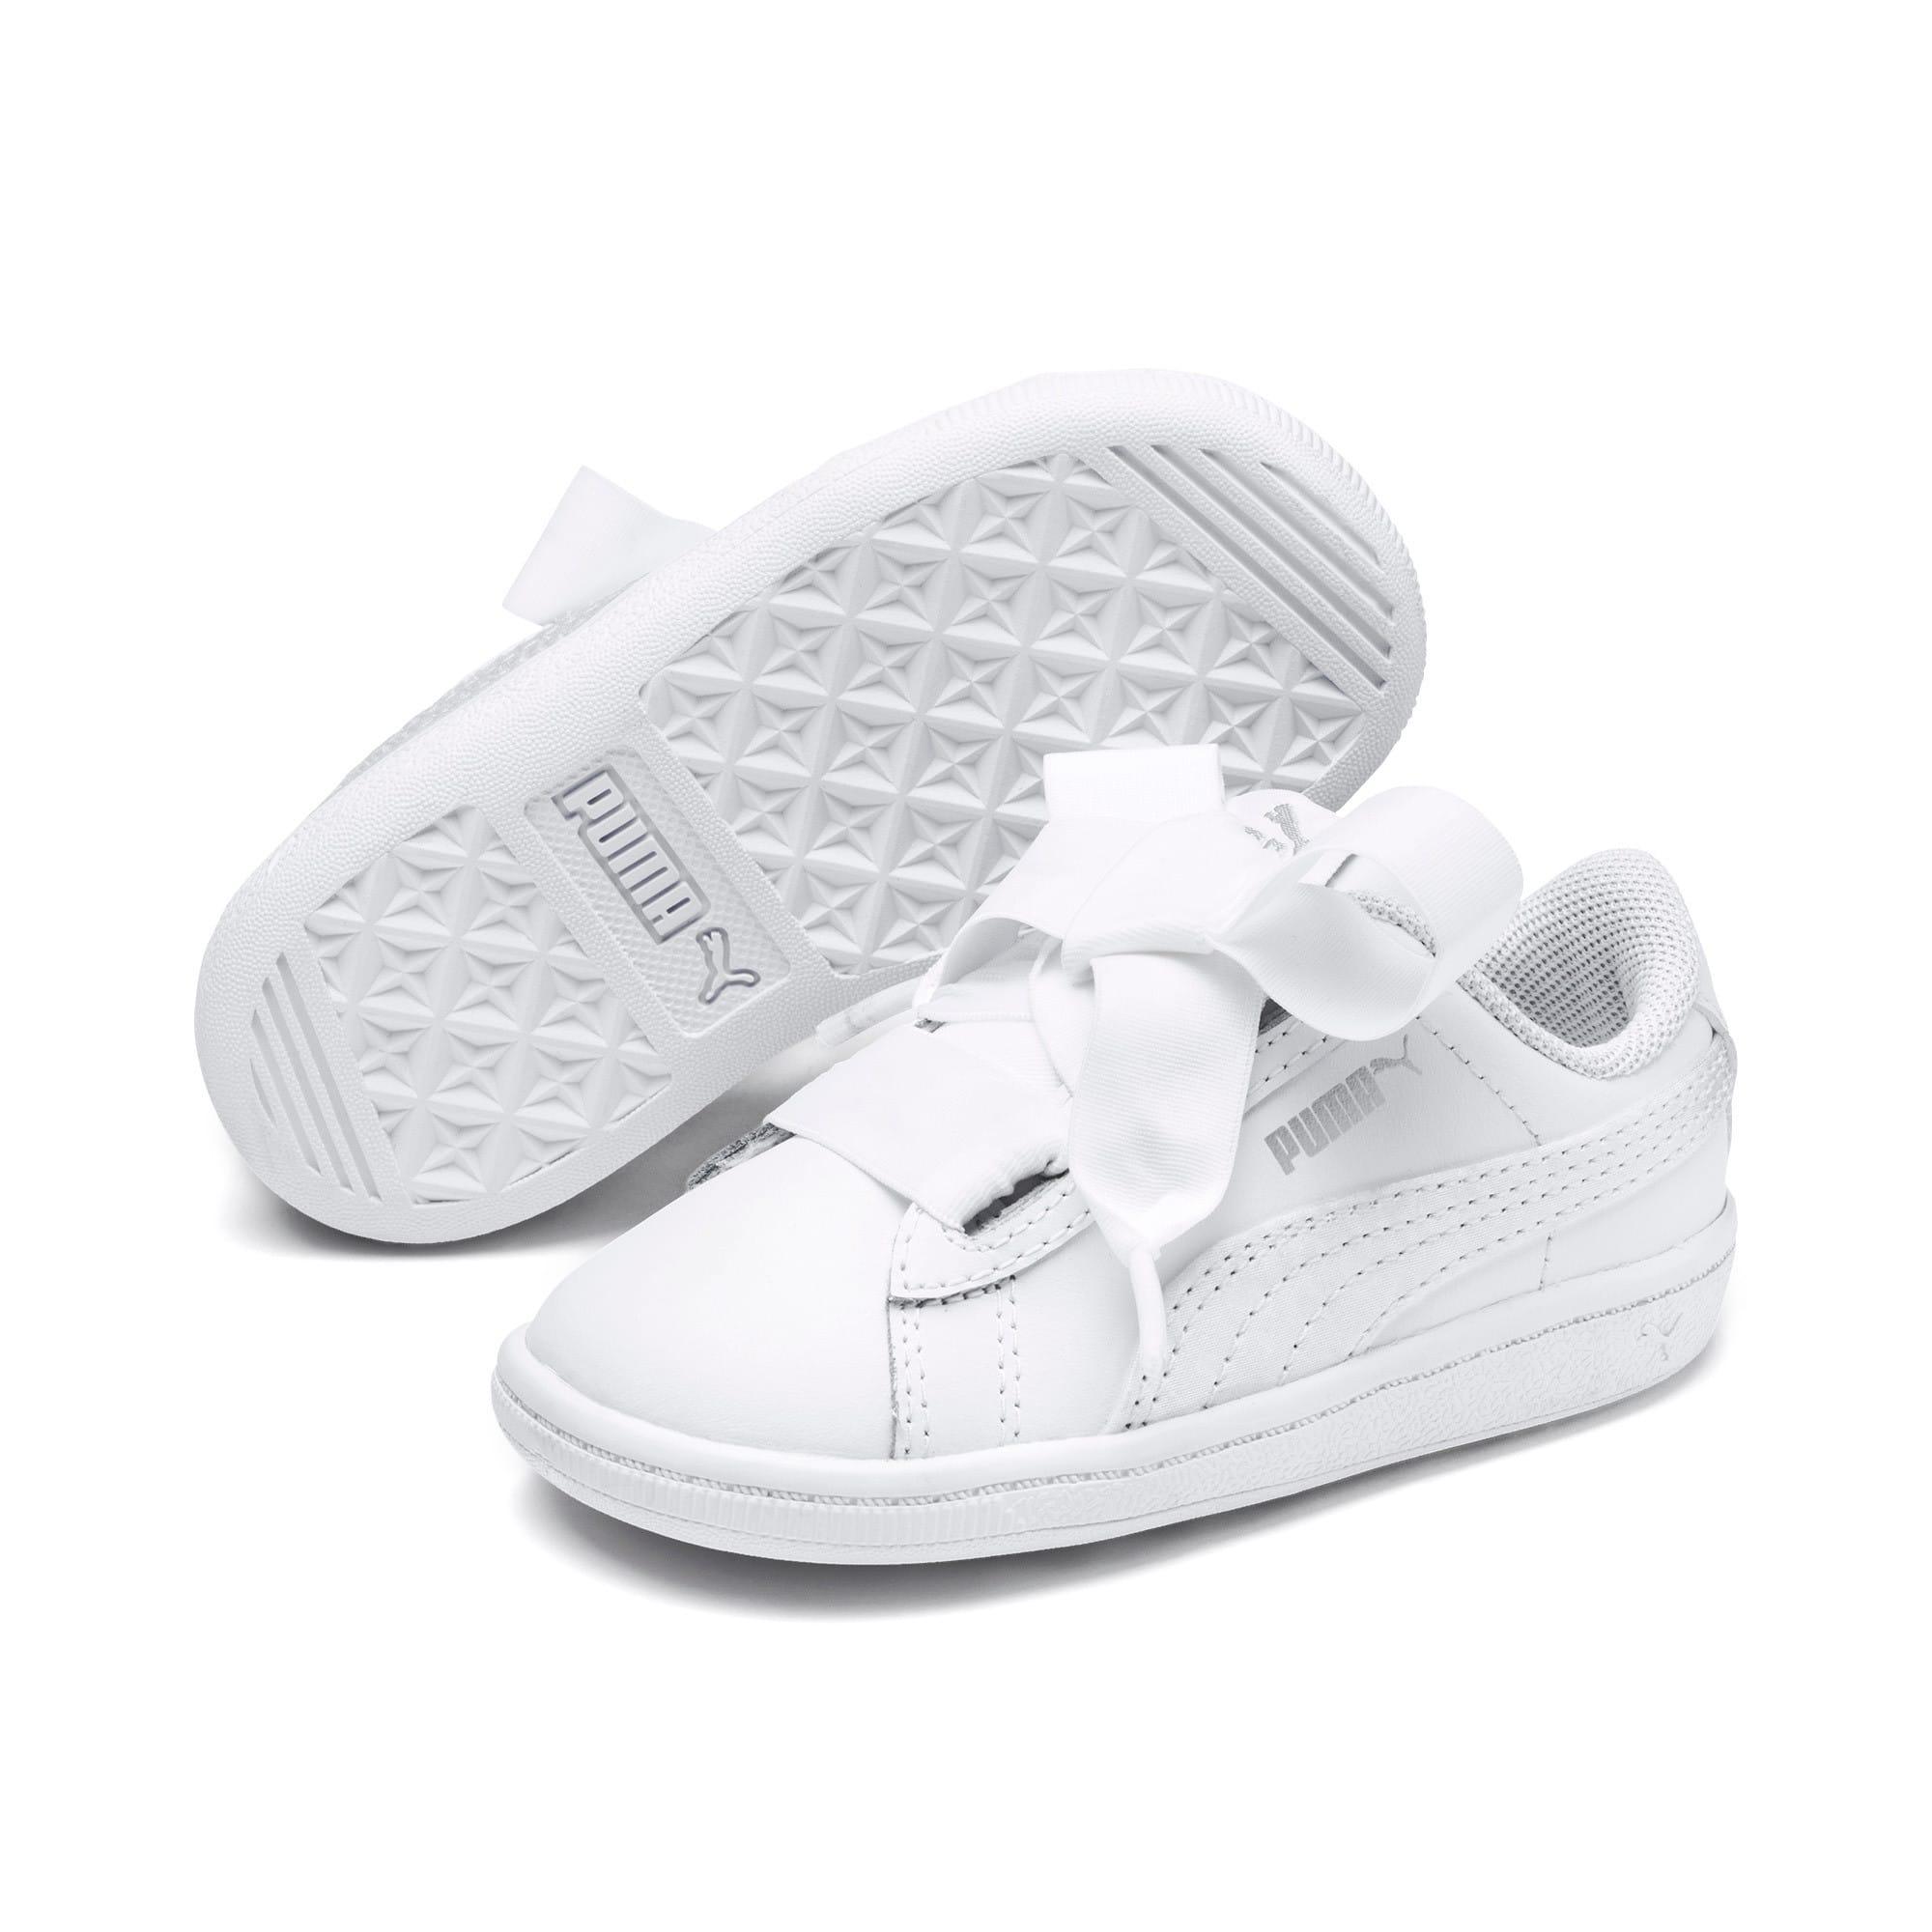 Miniatura 2 de ZapatosPUMA Vikky Ribbon Satin AC para niños, Puma White-Puma White, mediano